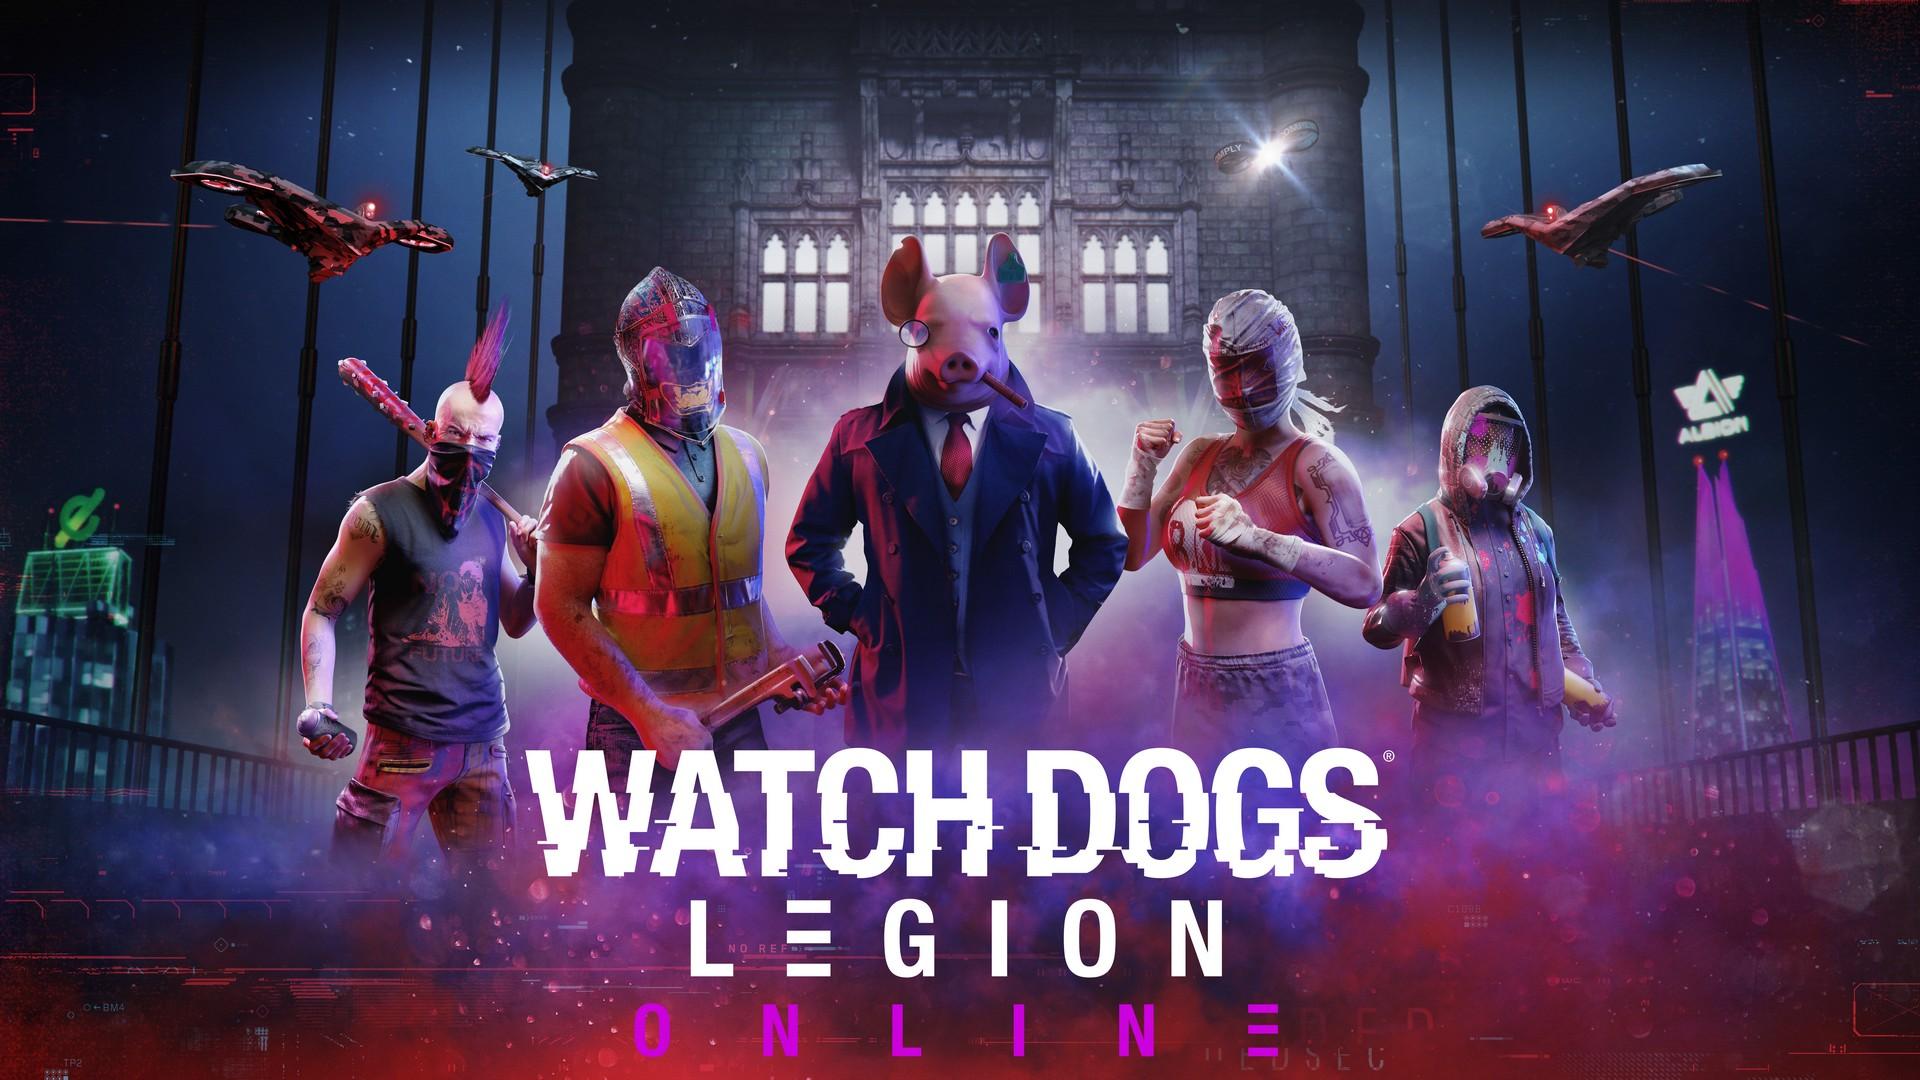 Watch Dogs Legion طور الأونلاين لعبة